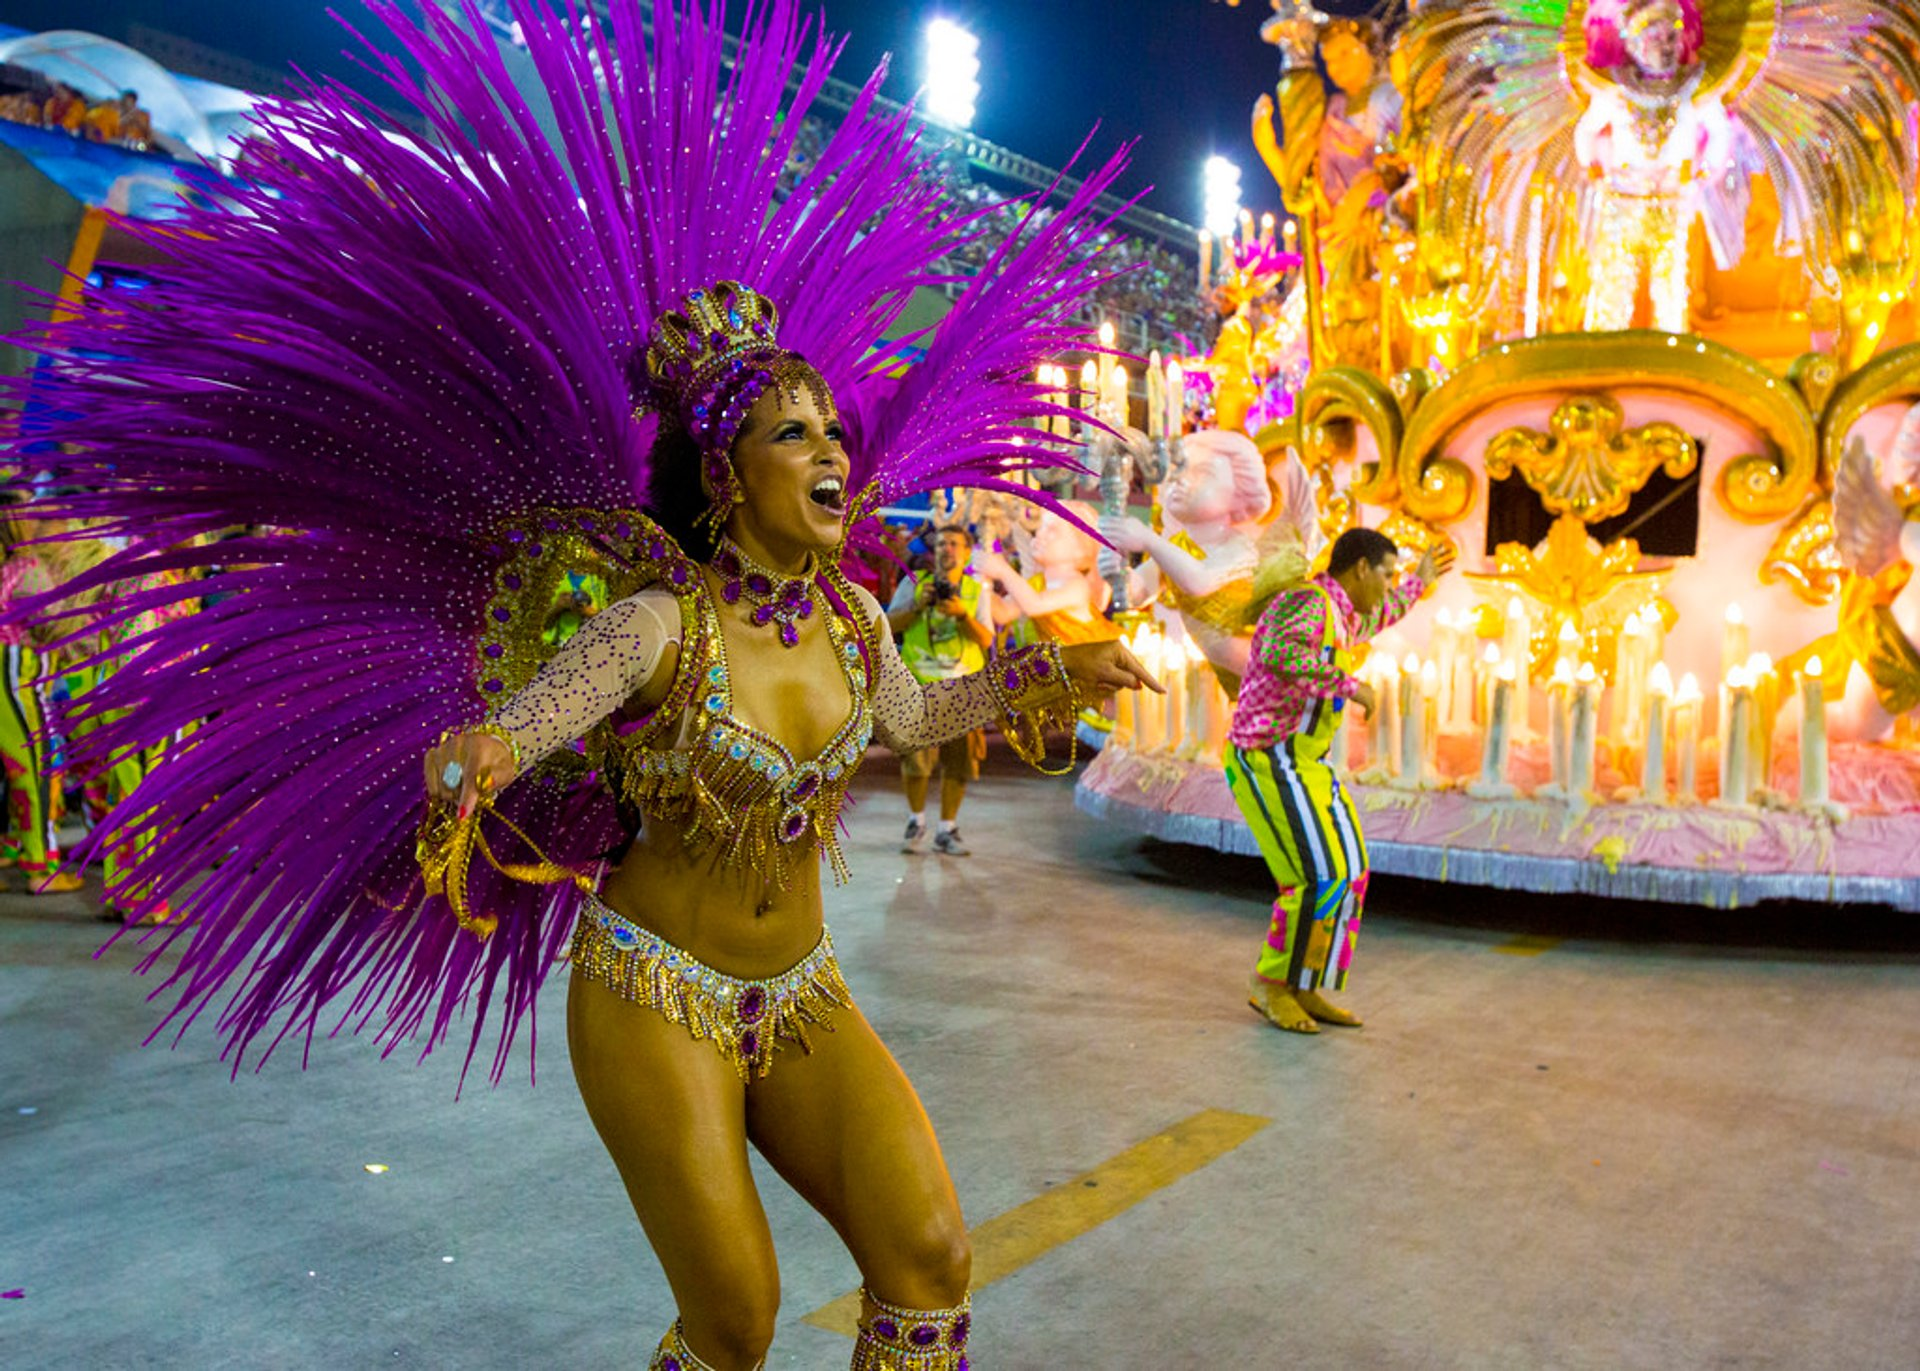 Rio Carnival in Rio de Janeiro - Best Season 2019